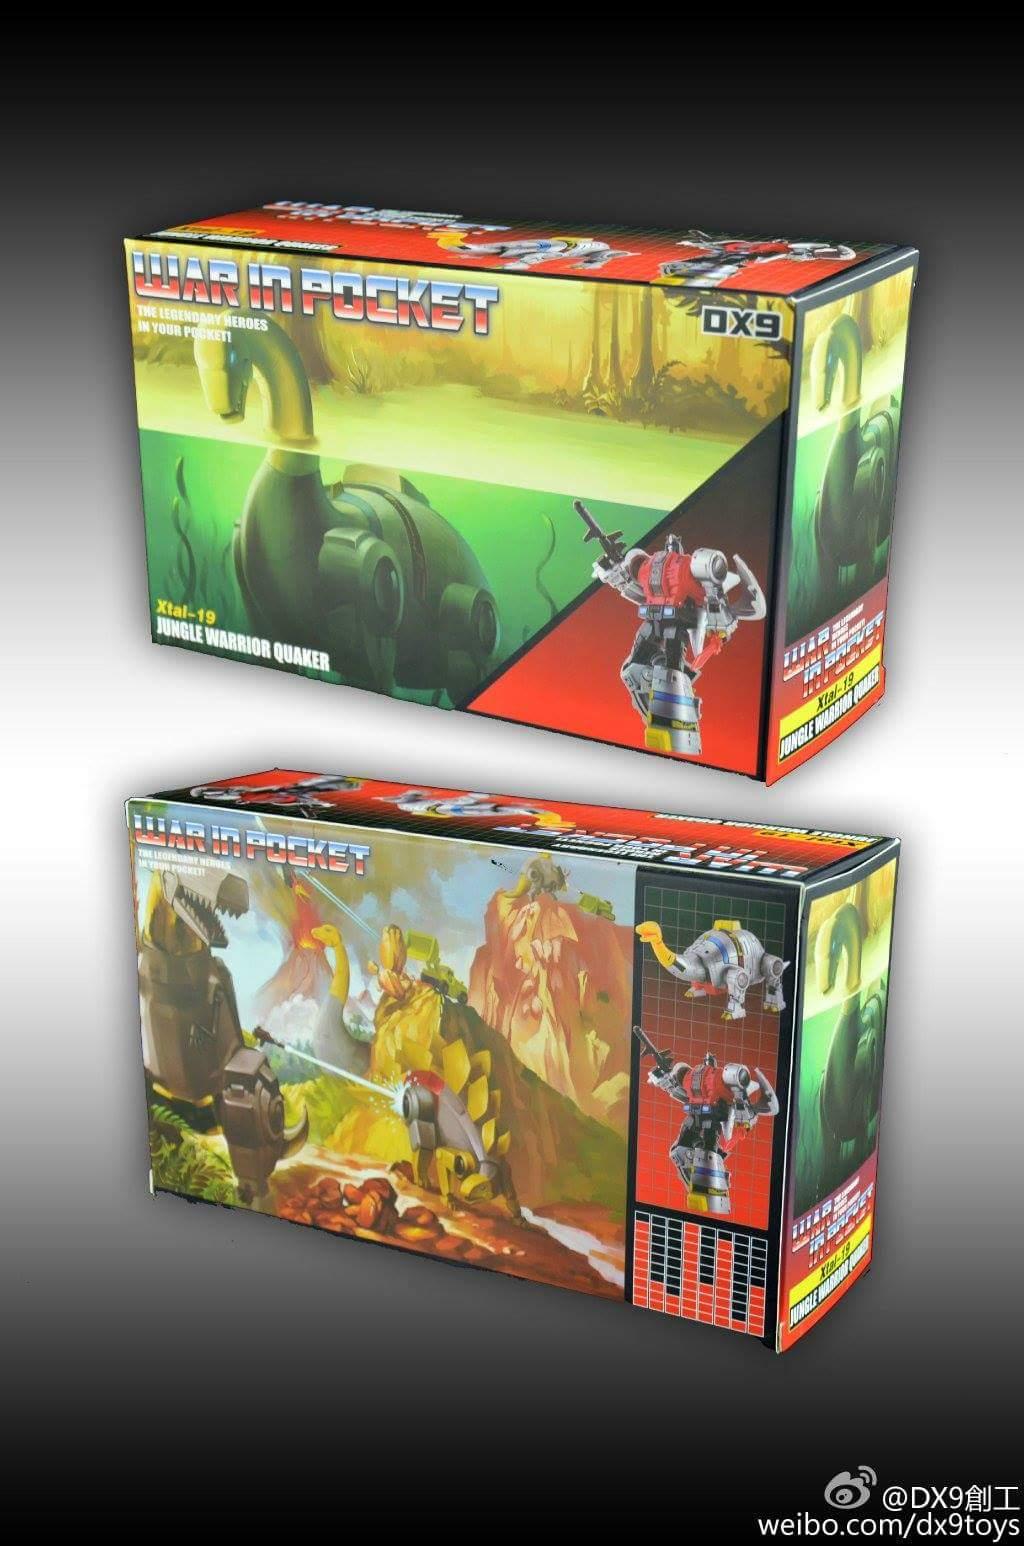 [DX9 Toys] Produit Tiers - Jouet War in Pocket (Taille Legends) - Page 5 JM7KGRLY